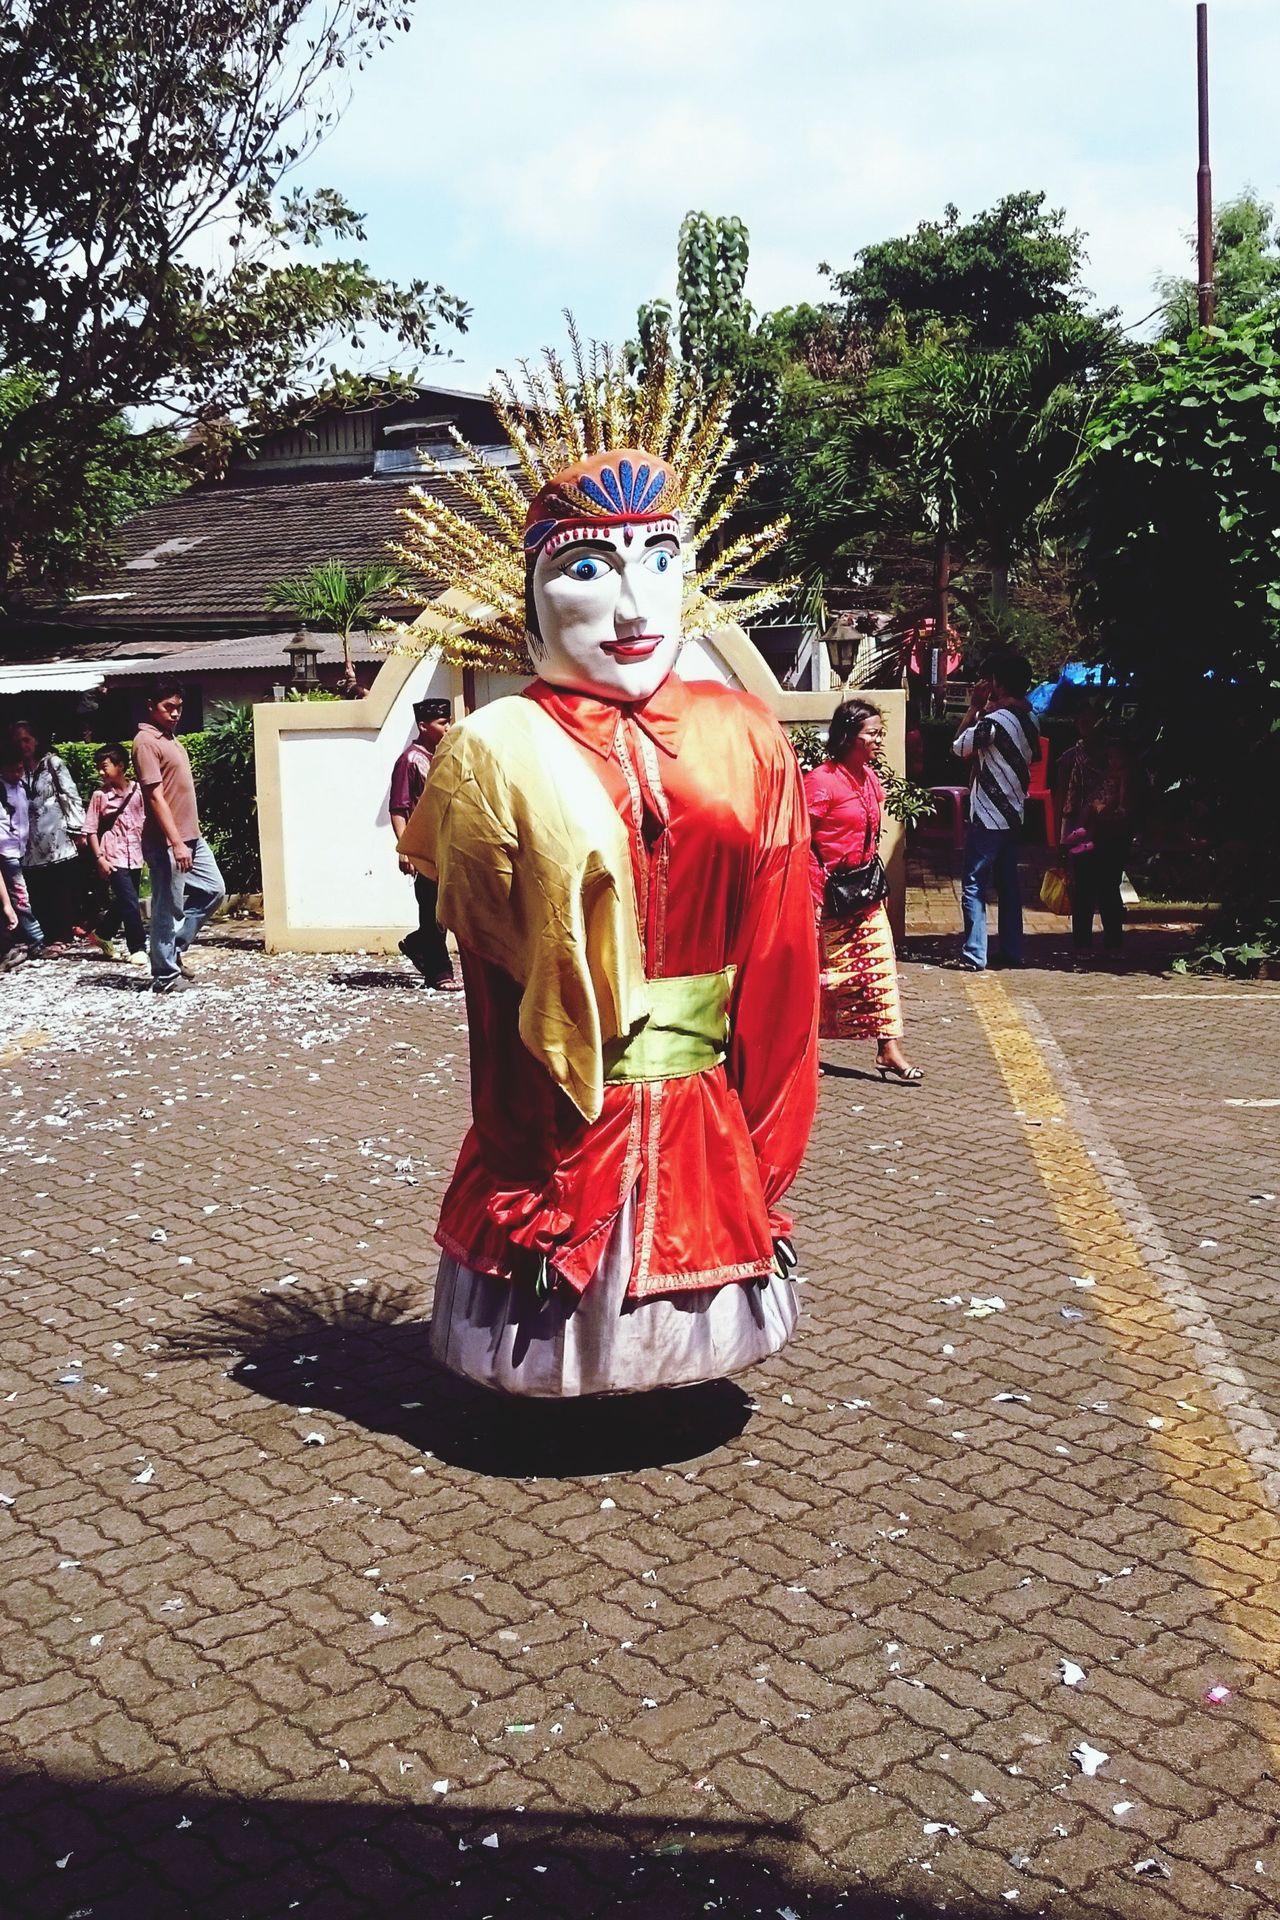 Ondel-ondel Outdoors Human Representation Puppet Ondel-ondel People Culture Festive Folk Village